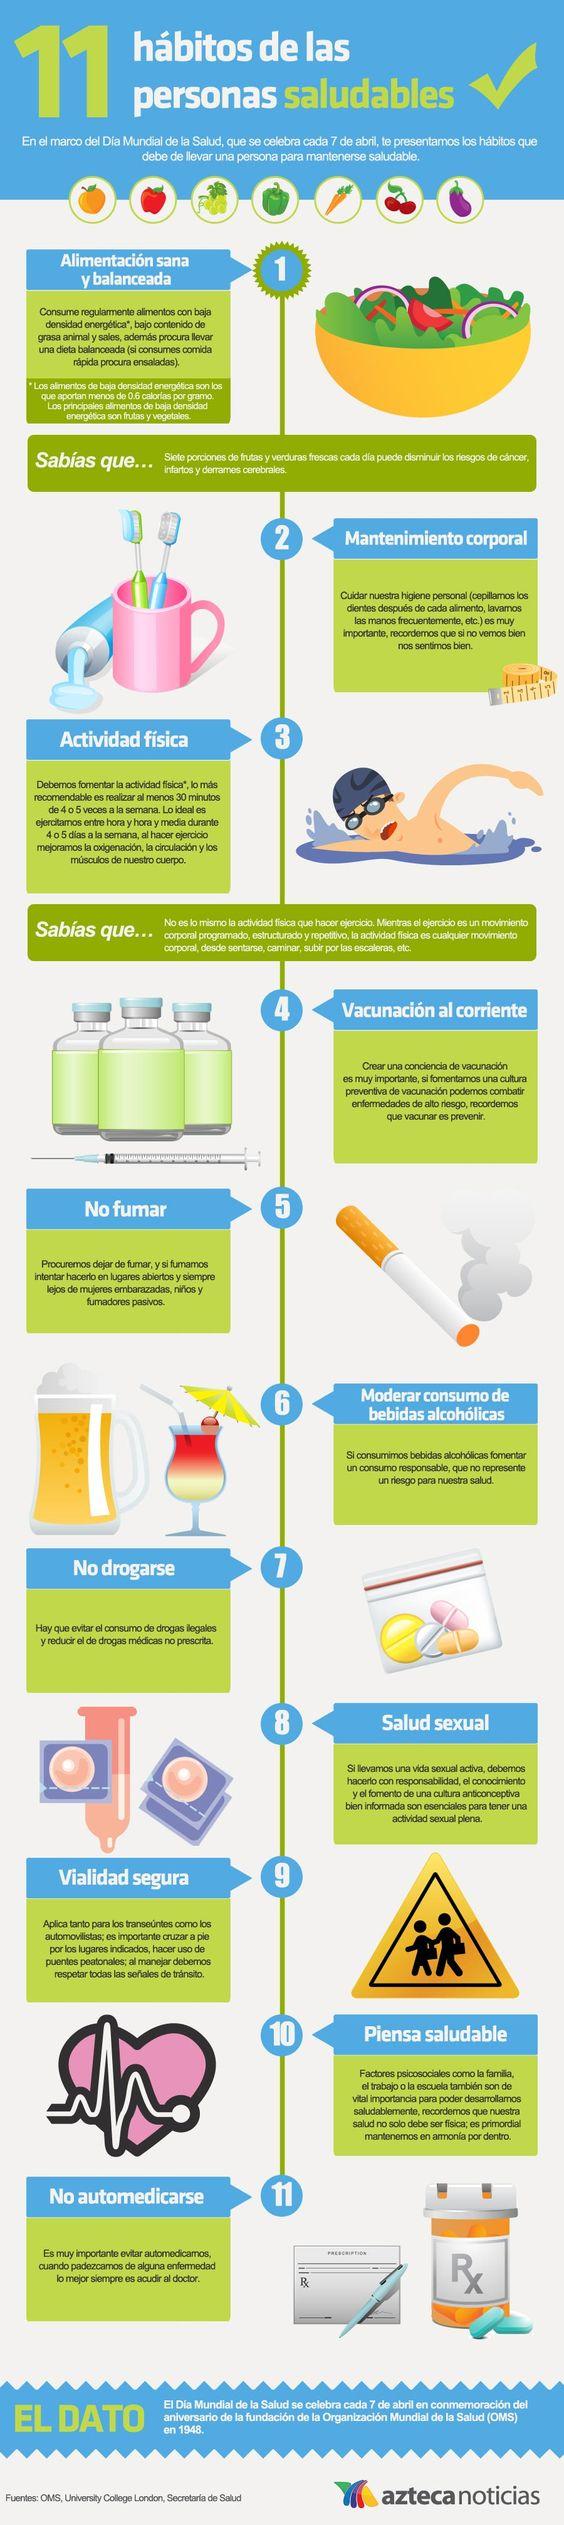 11 hábitos de las personas saludables #Infografia: